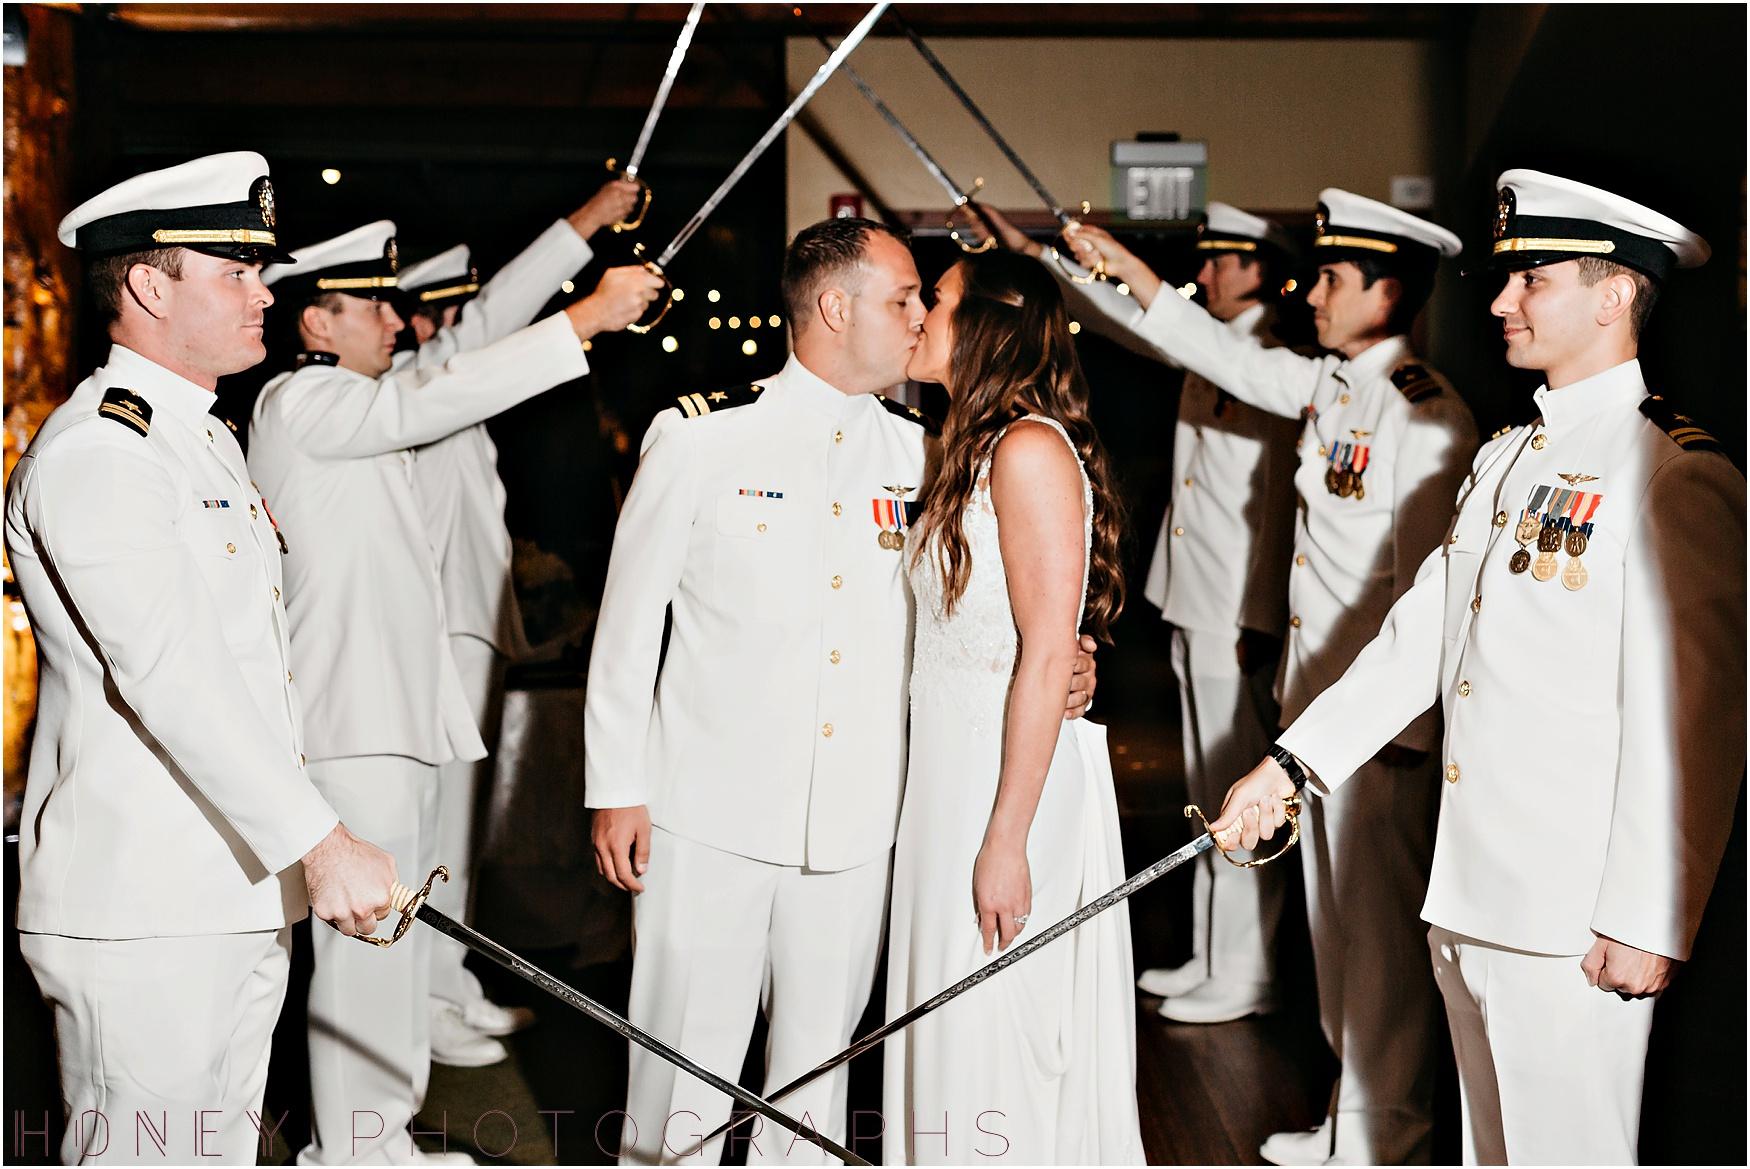 bali-hai-tropical-bubble-exit-party-paradise-wedding055.jpg